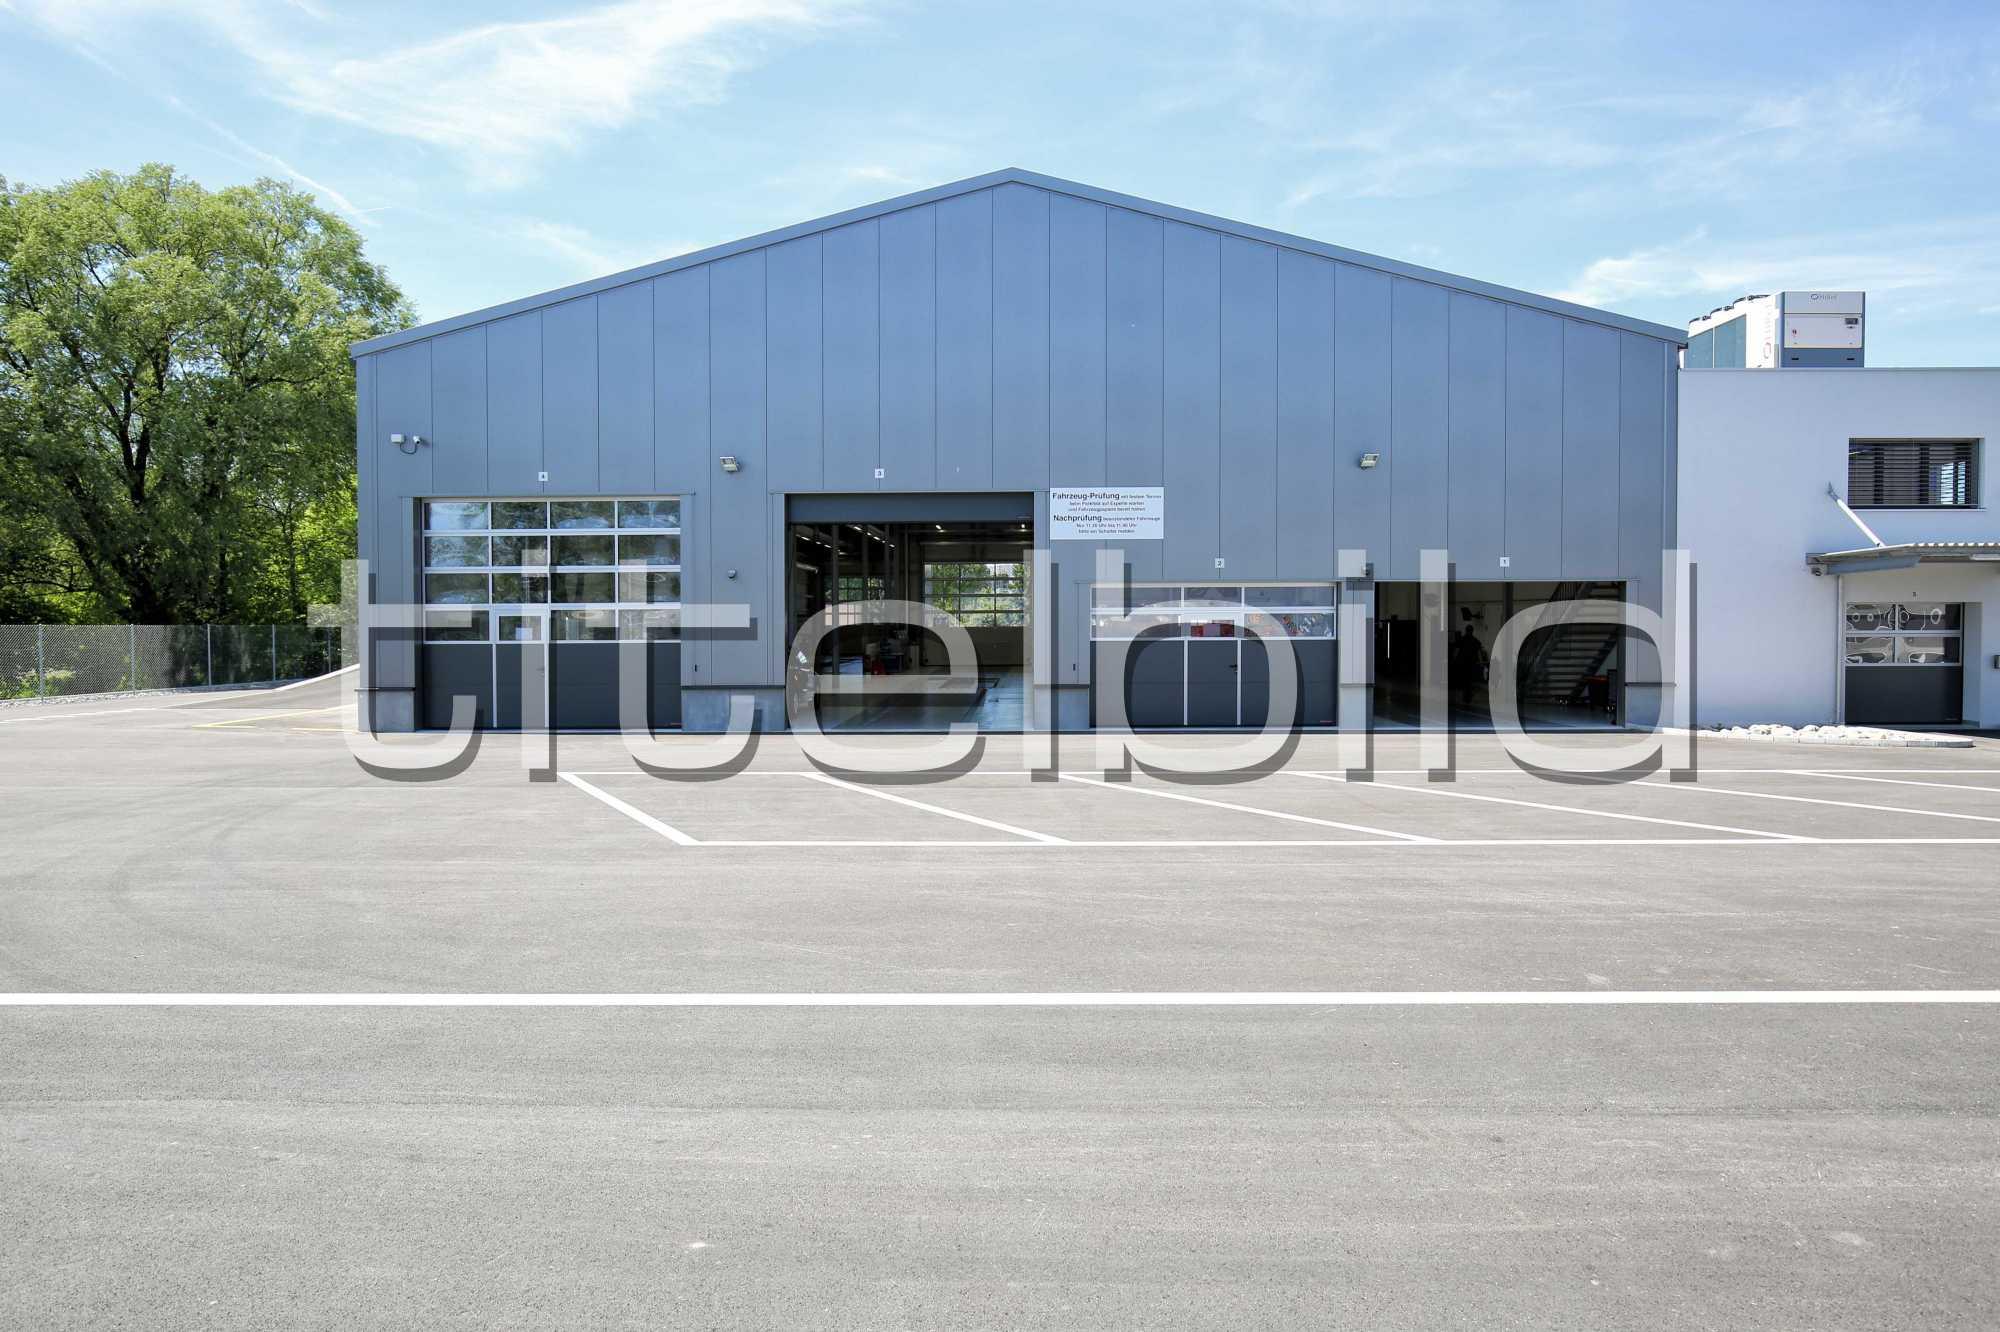 Projektbild-Nr. 4: Neubau Strassenverkehrsamt Kanton Zürich